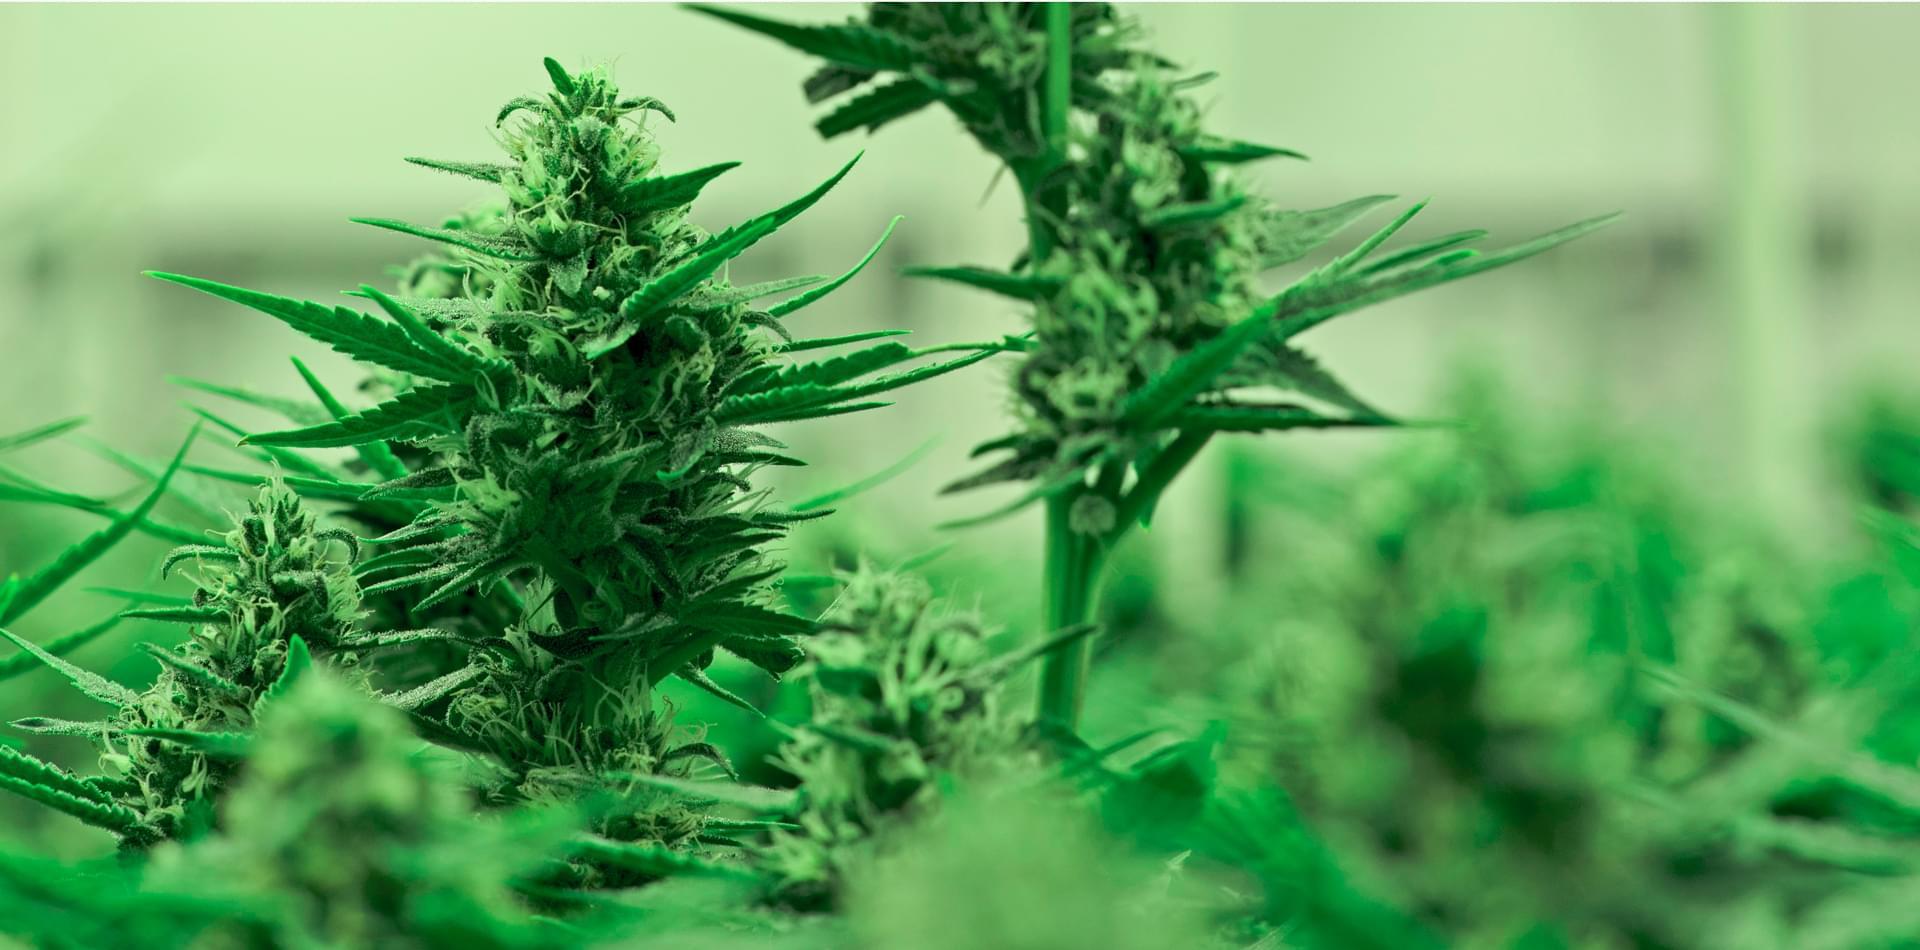 Hemp plants and cannabis plants.